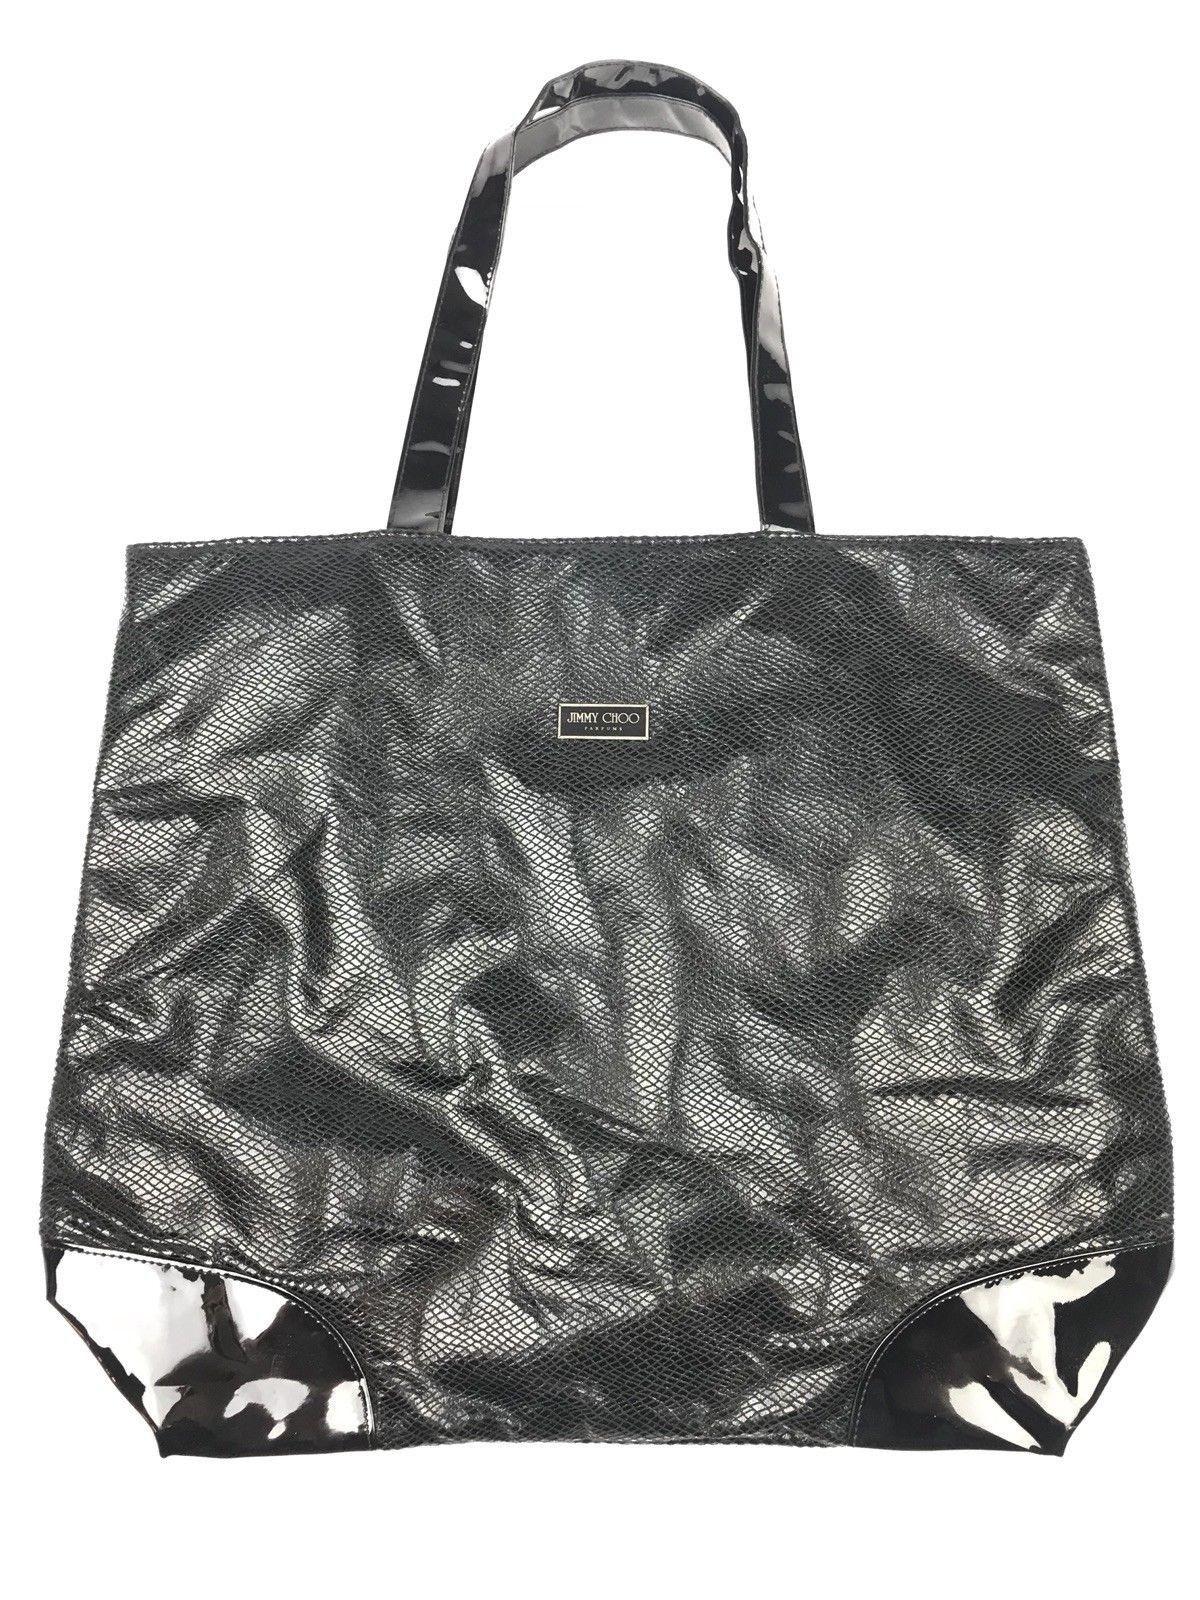 482d468204 Jimmy Choo Perfume Tote Black Beach Bag | Designer Women Bags | Bags ...